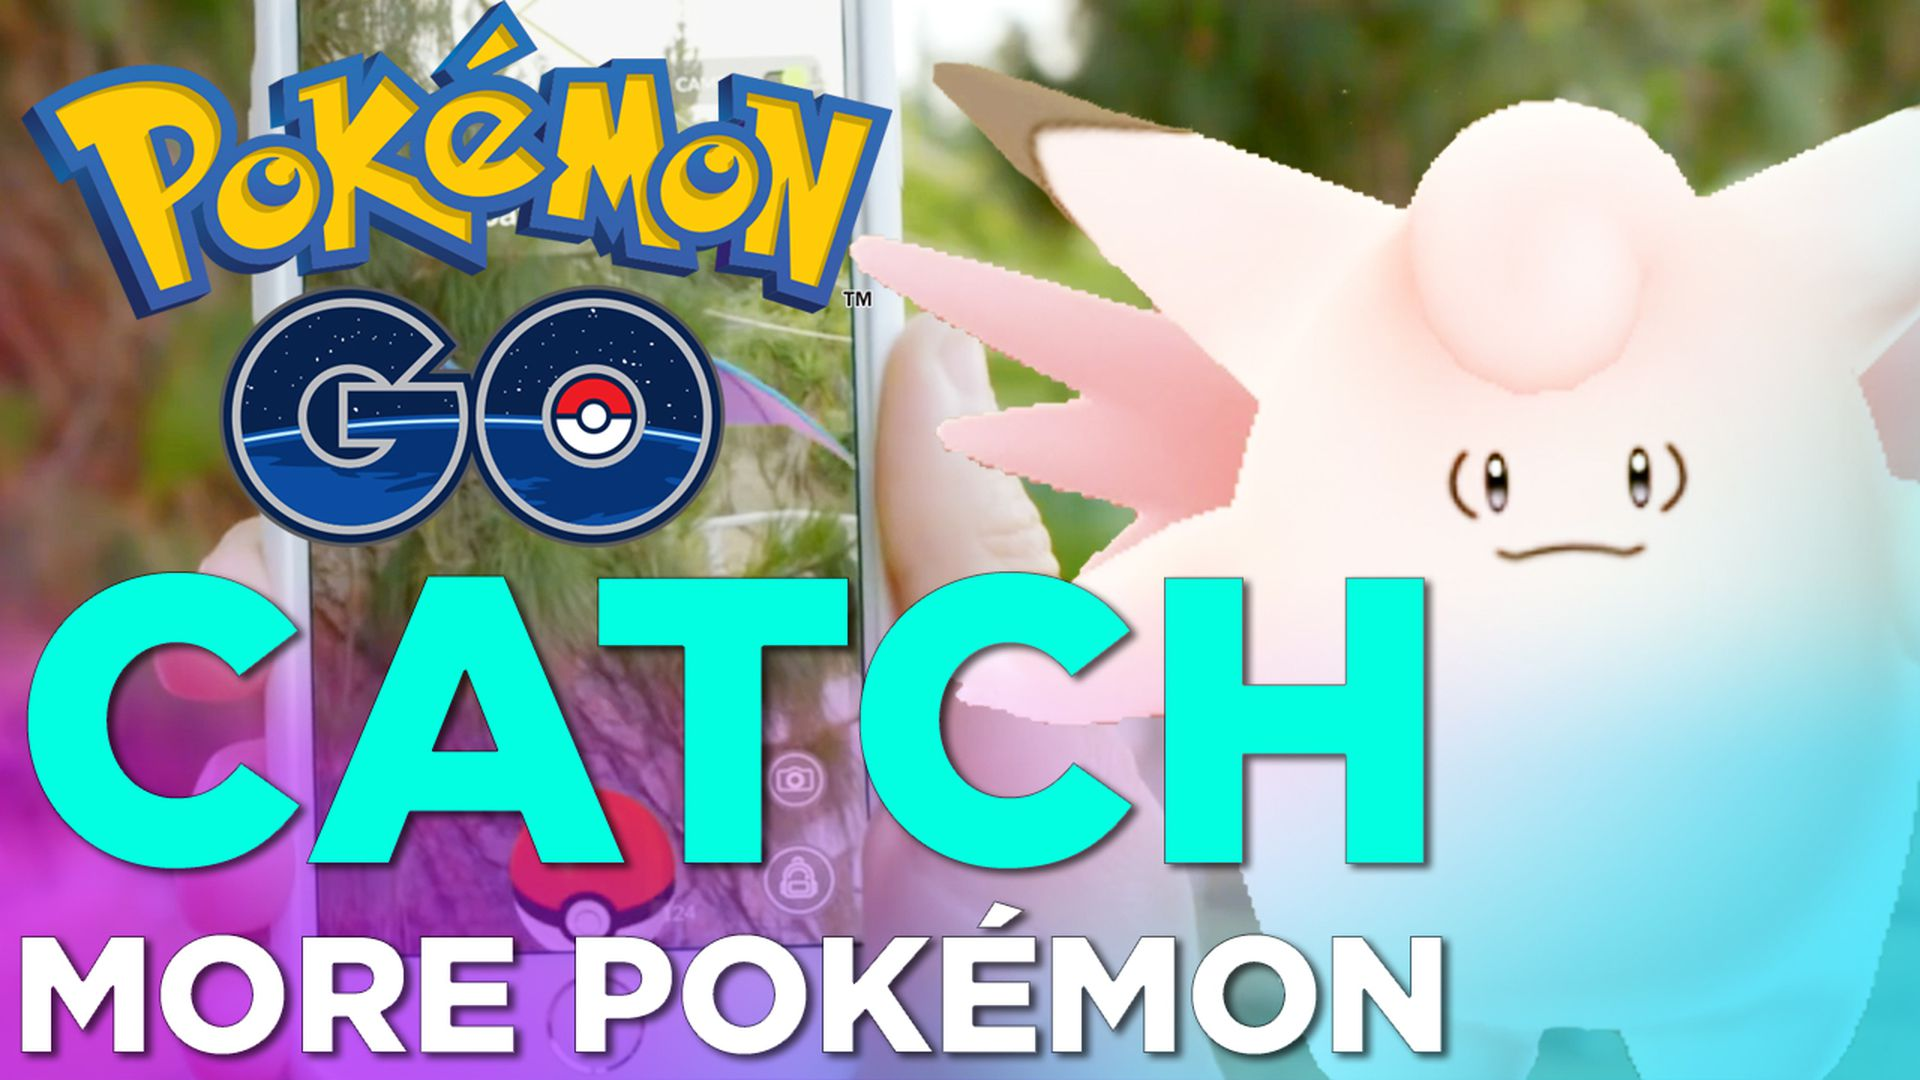 Pokémon Go player has already caught 'em all